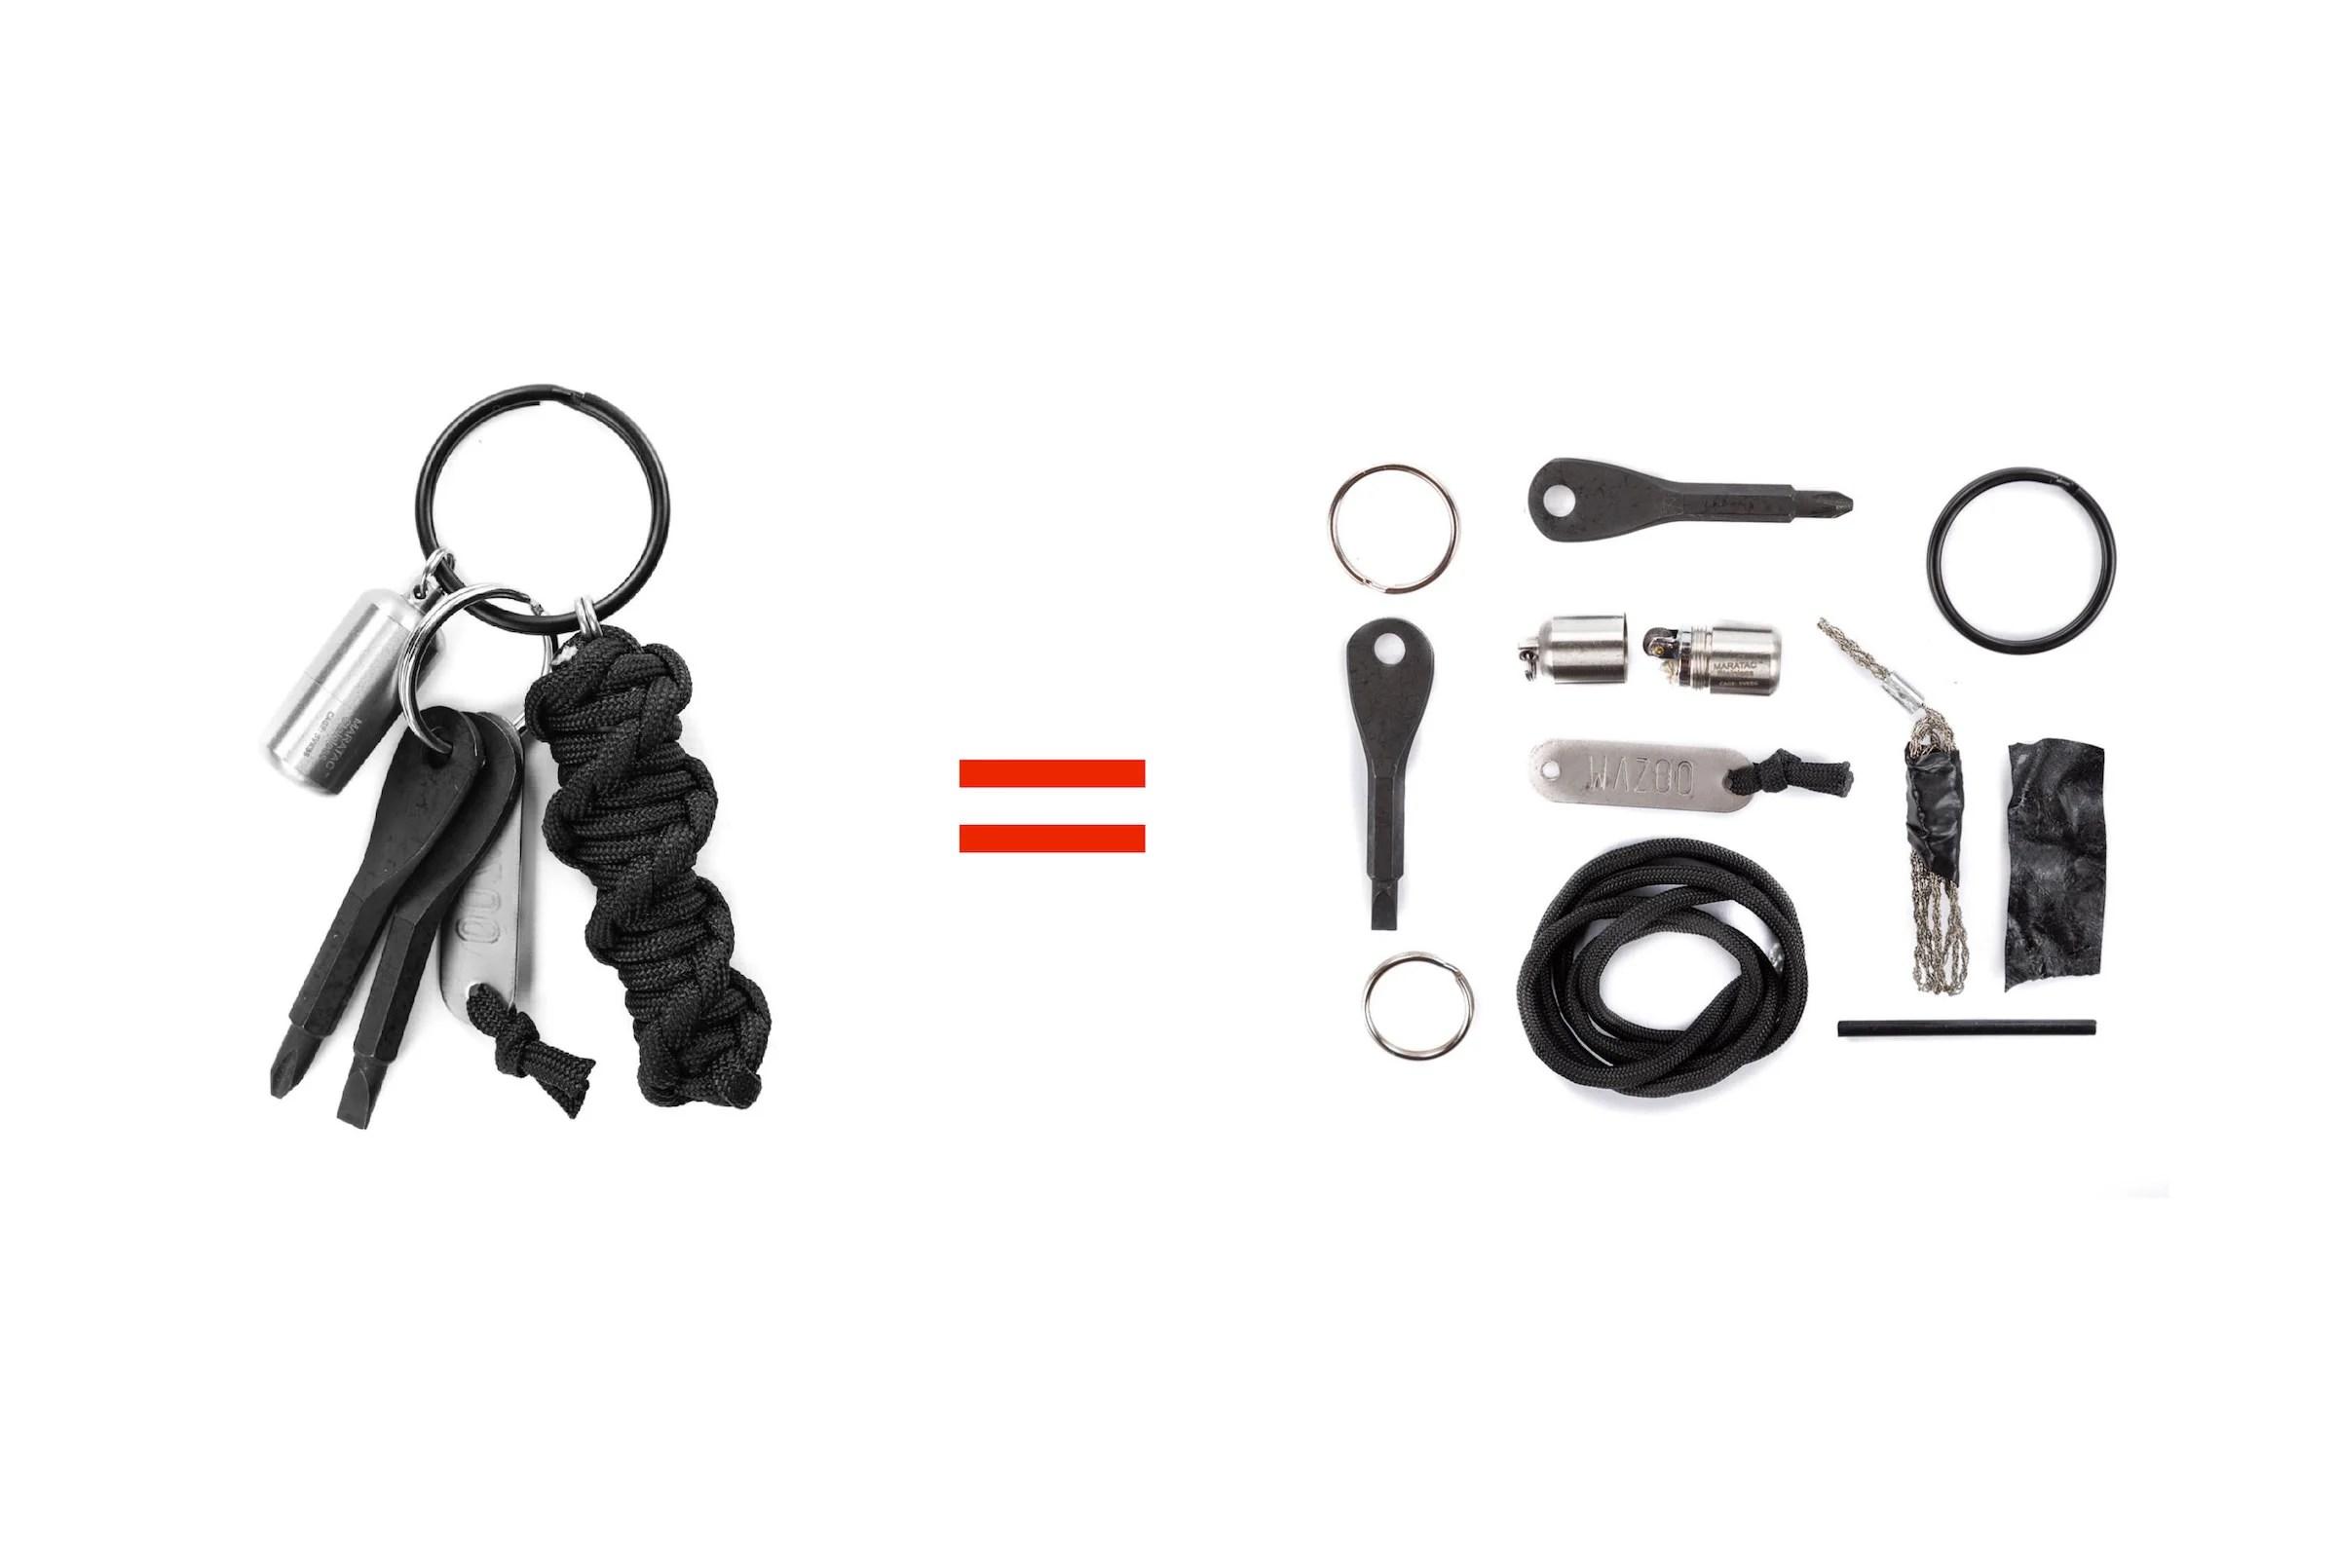 The Huckberry Essential EDC Kit